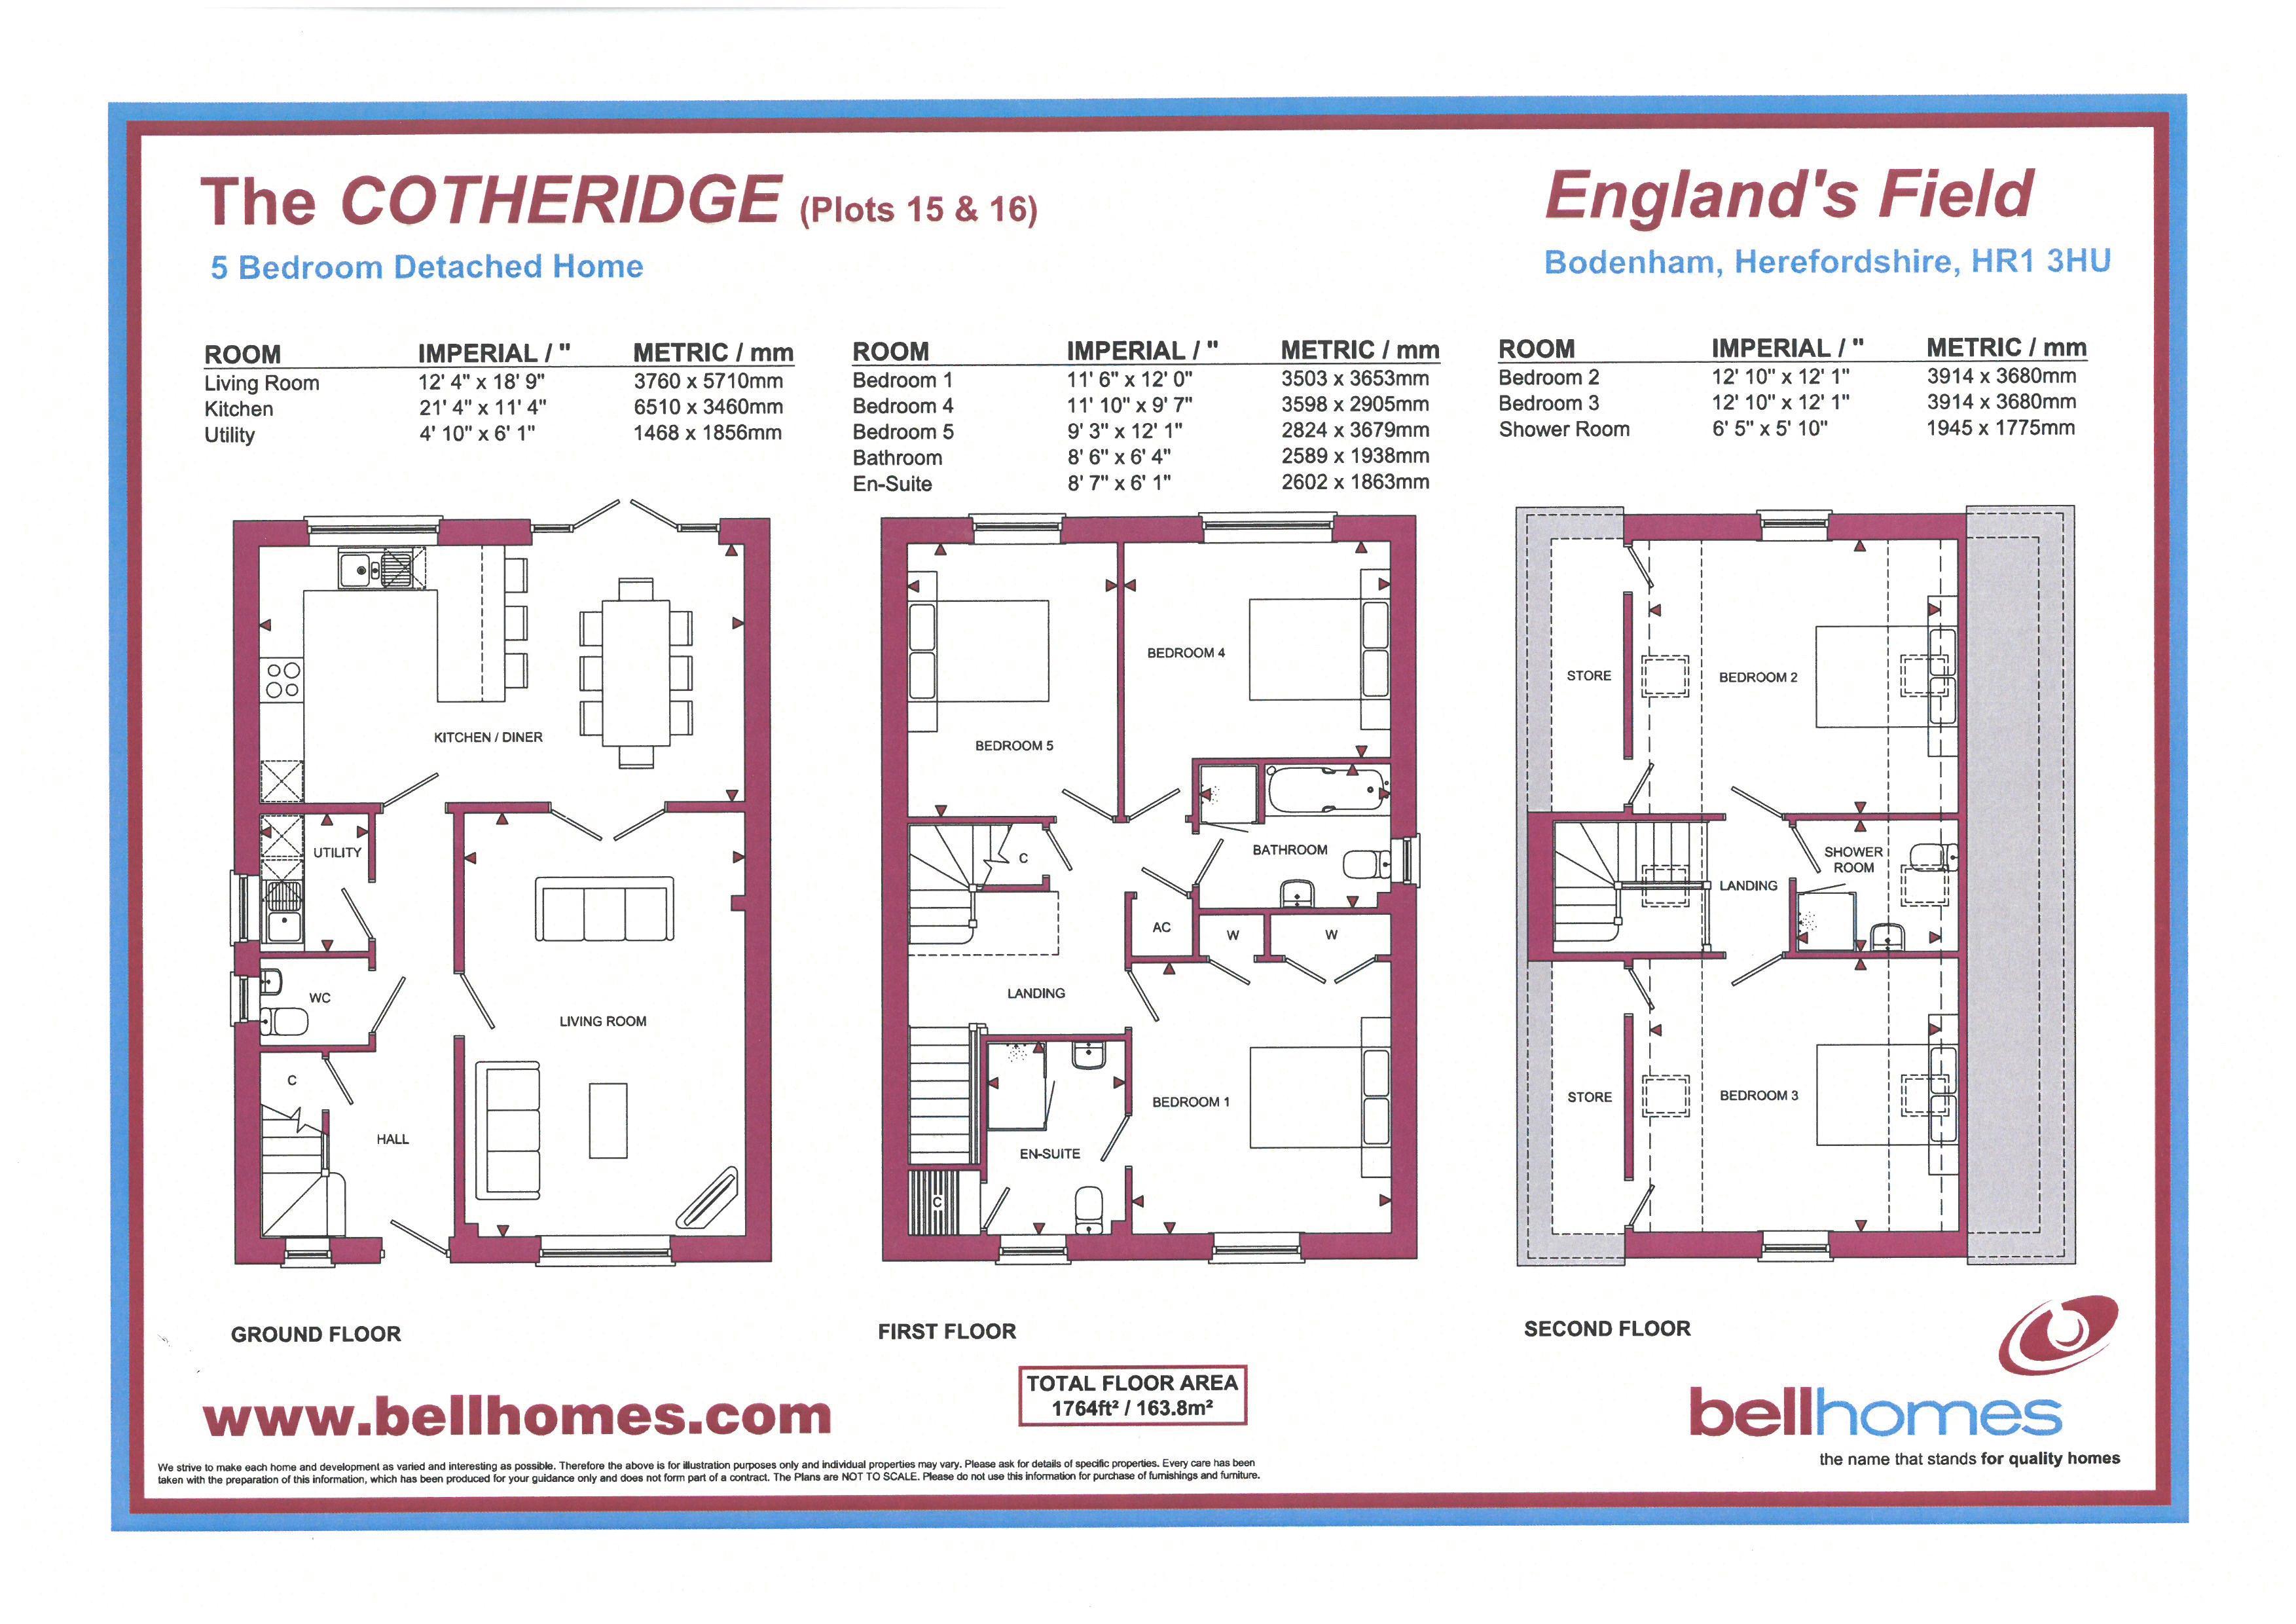 England 's Field Bodenham